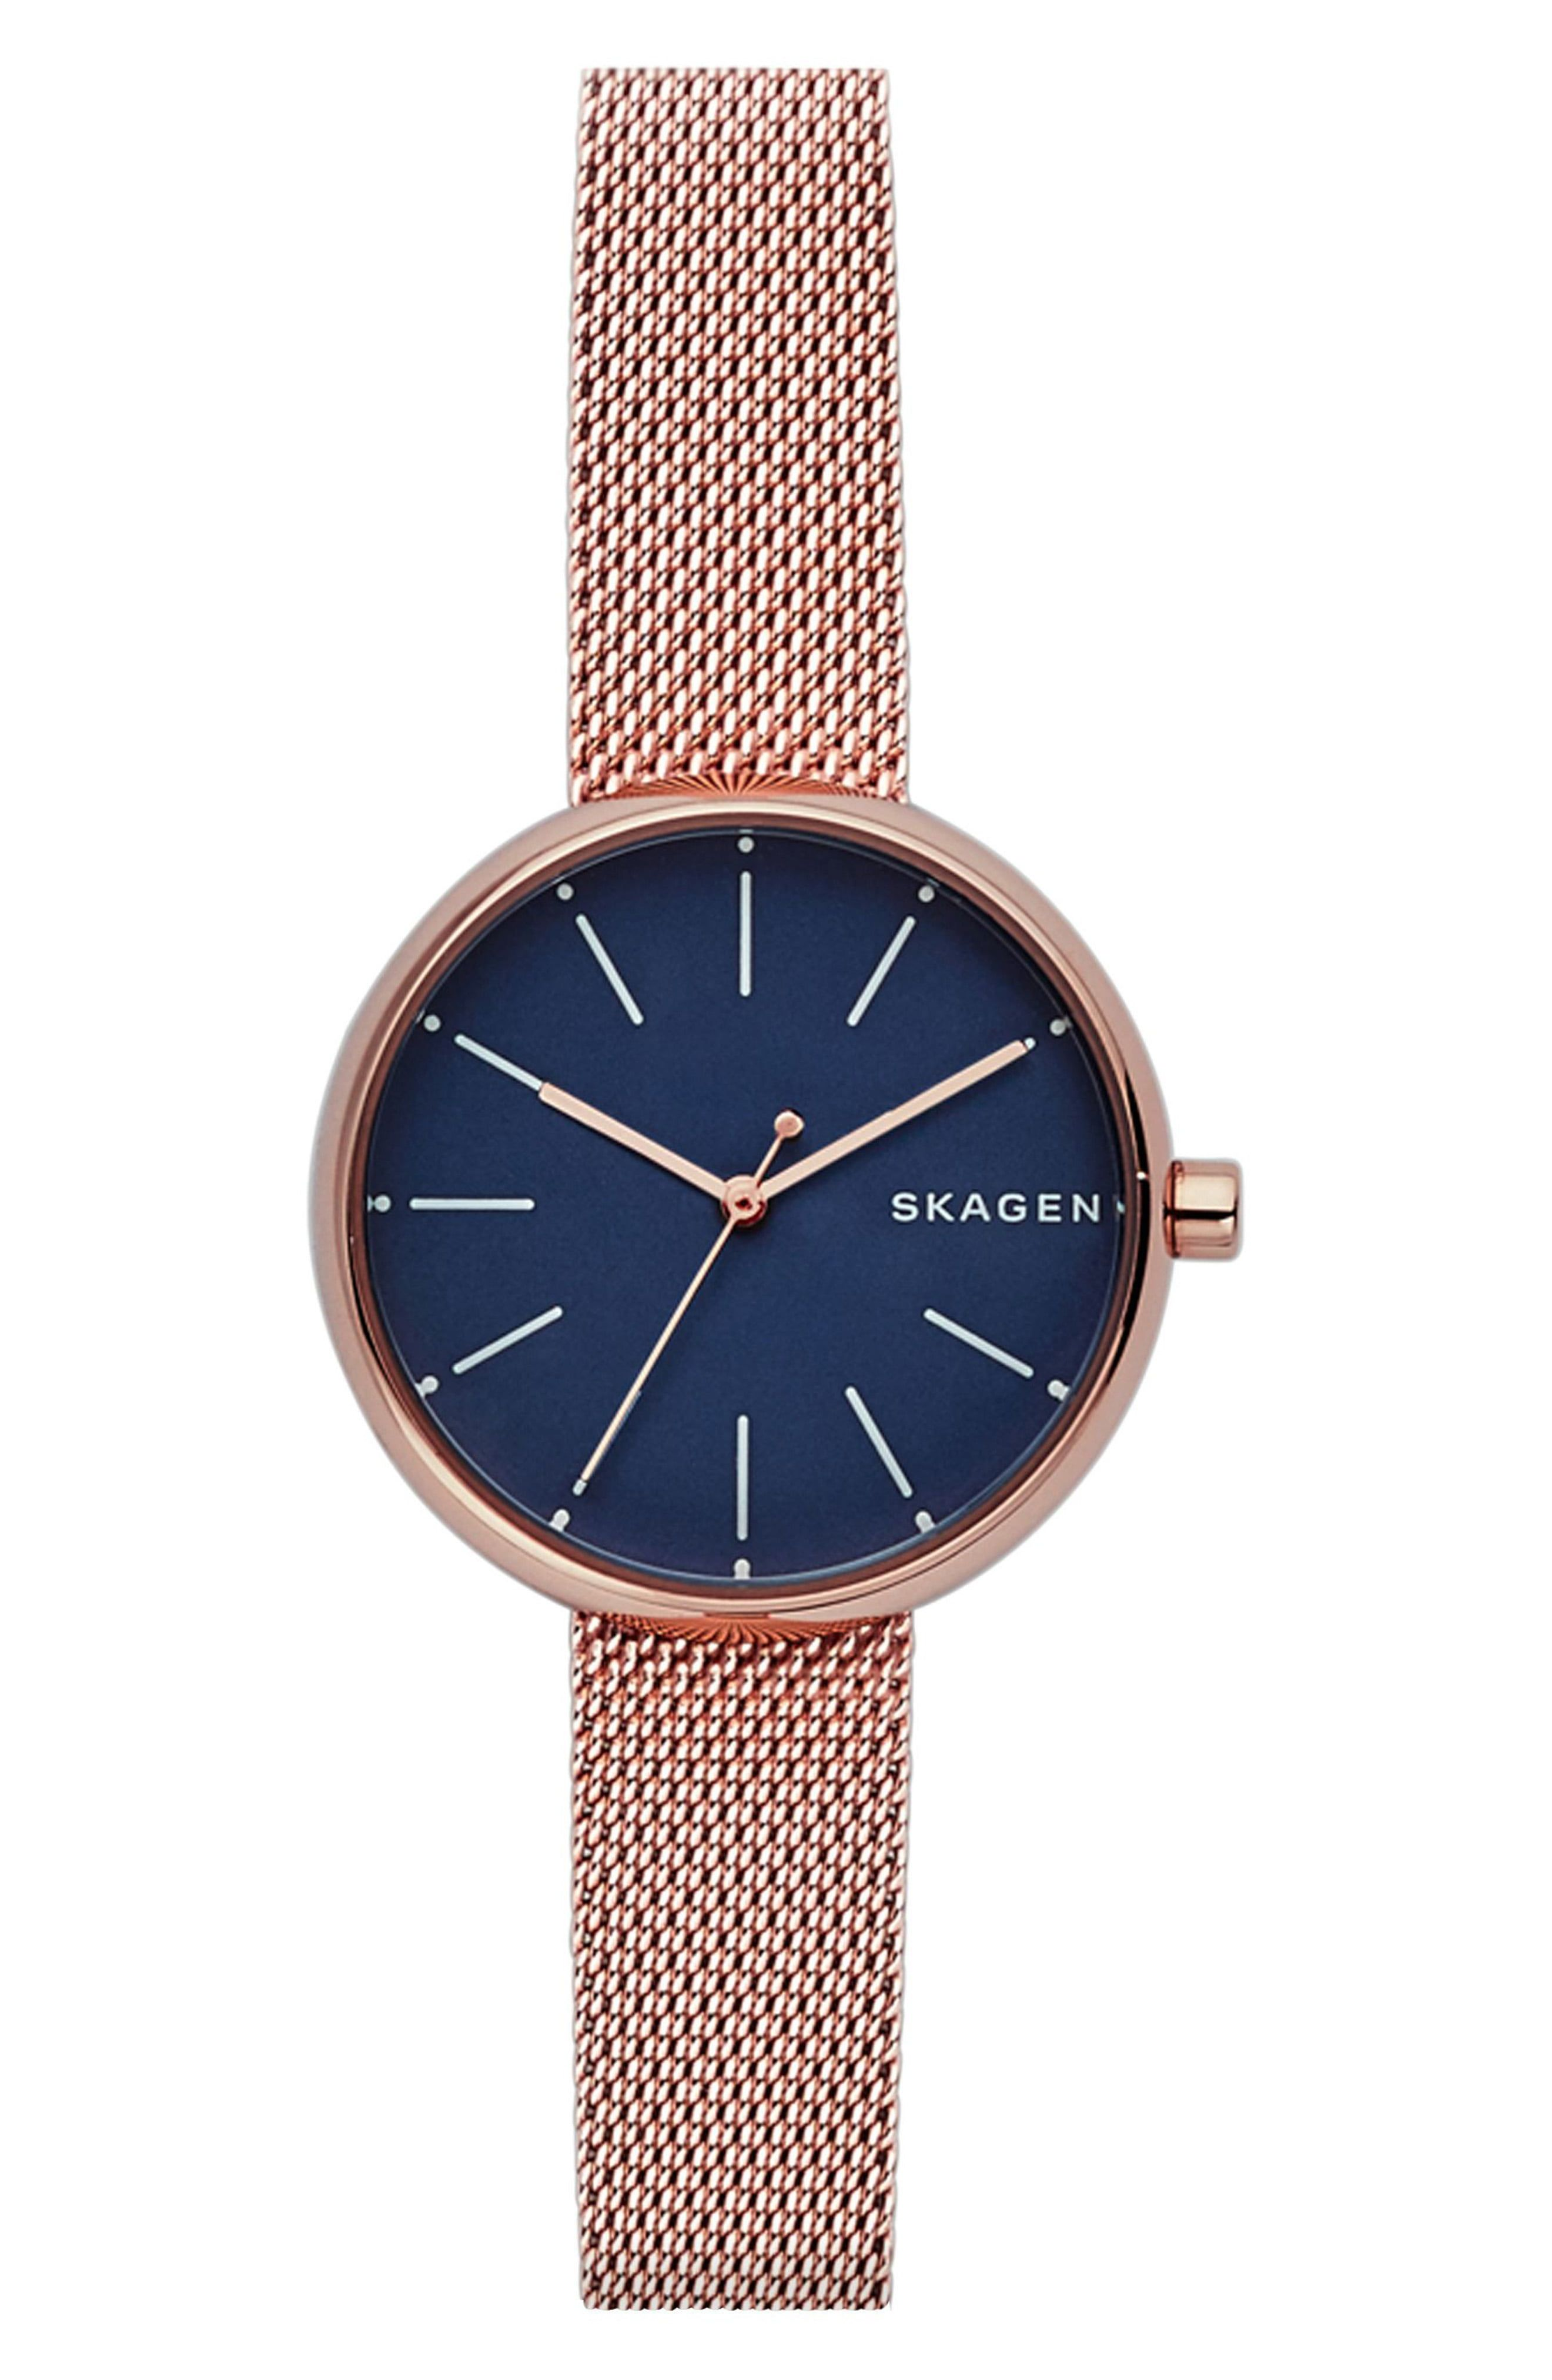 368805a0d Skagen Round Mesh Strap Watch, 30mm in 2019 | Products | Mesh ...